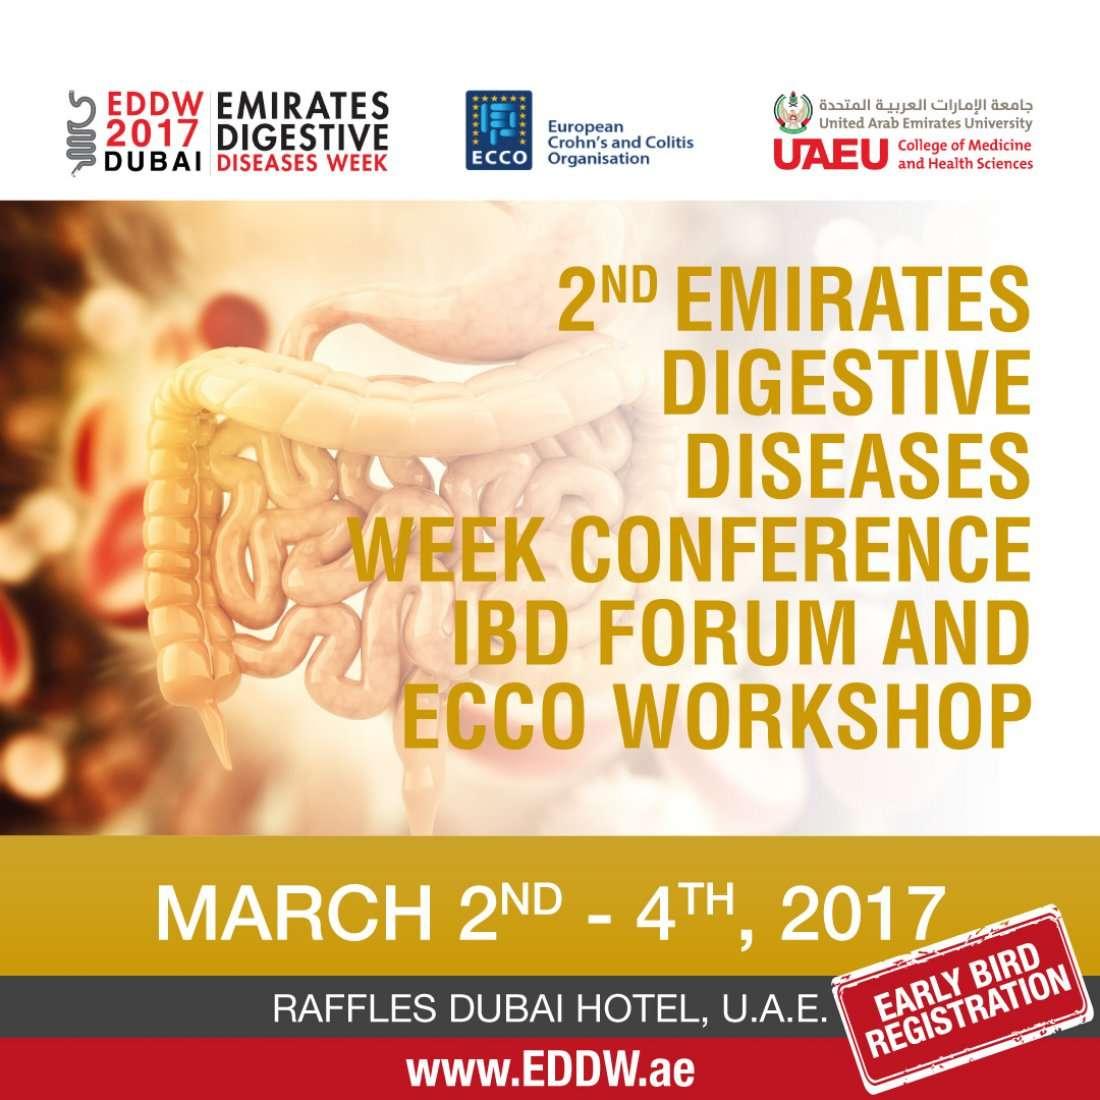 2nd Emirates Digestive Diseases Week (EDDW) Conference, IBD Forum